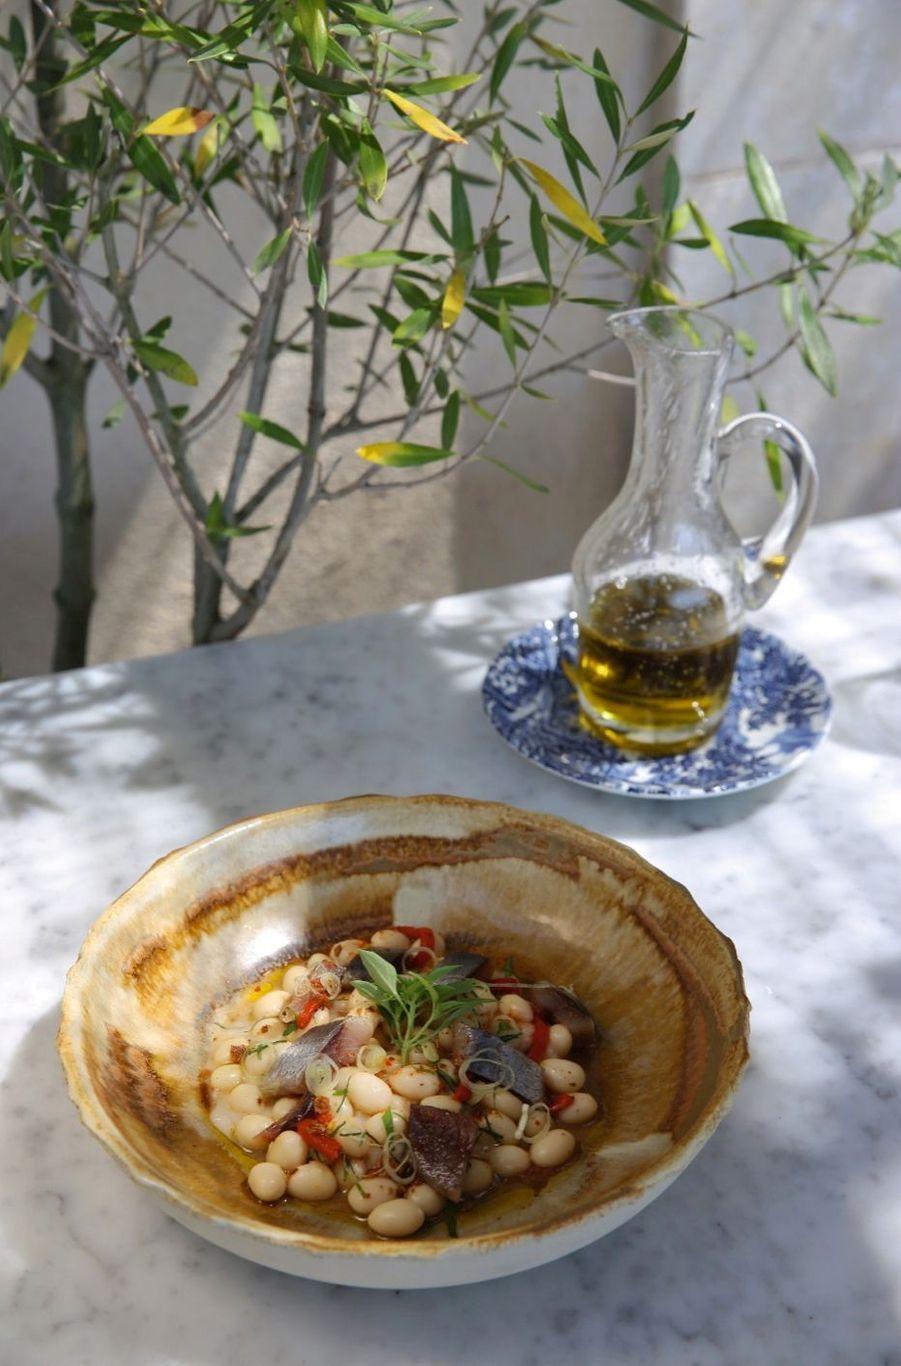 Salade de haricots cocos de Haute-Provence, sardine mi-fumée signée JeanFrançois Pièg